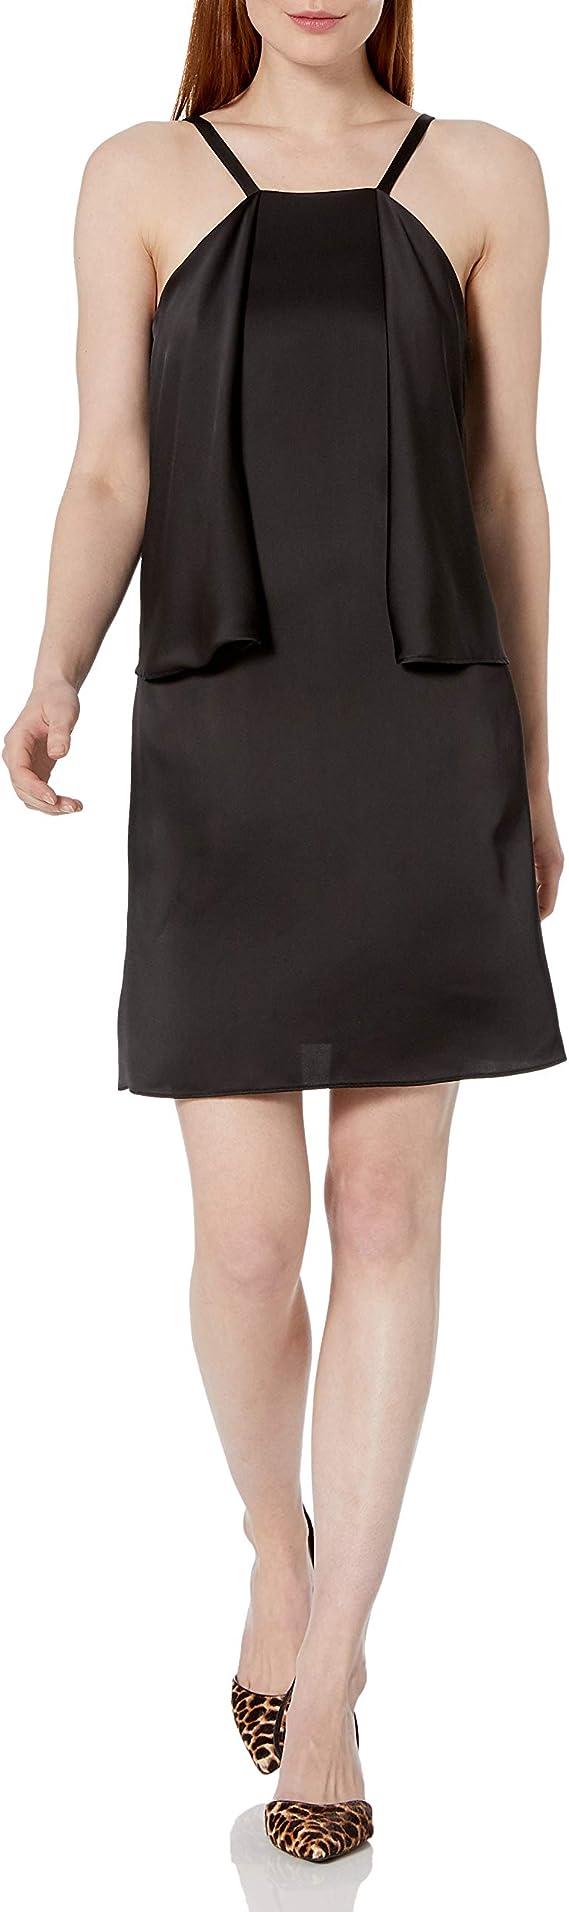 Embellished Pop-Over Dress Black Laundry by Shelli Segal